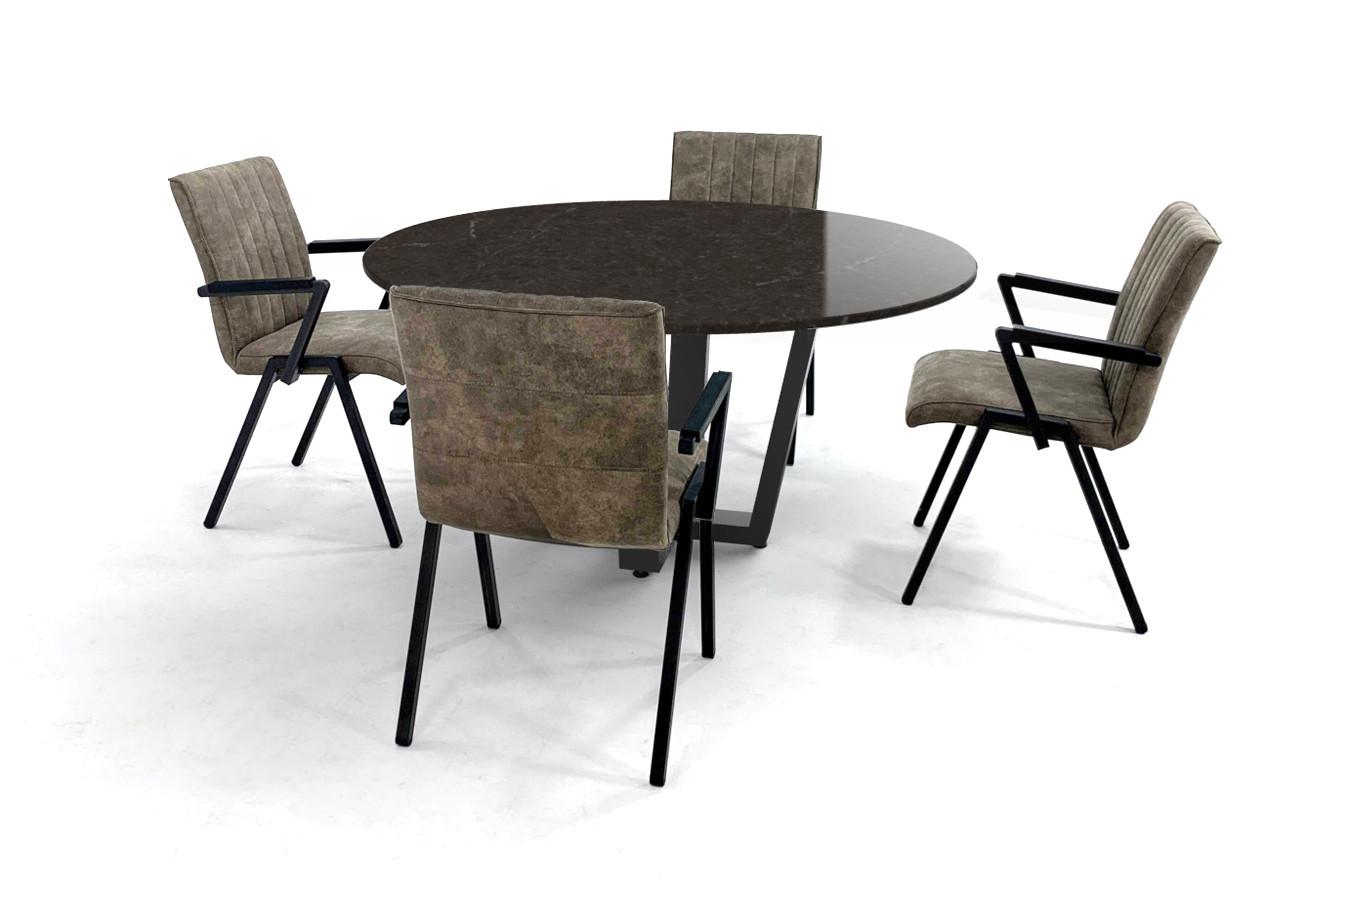 Ronde eettafel met Silestone Eternal Emperador blad en Loja eetkamerstoelen met armleuning